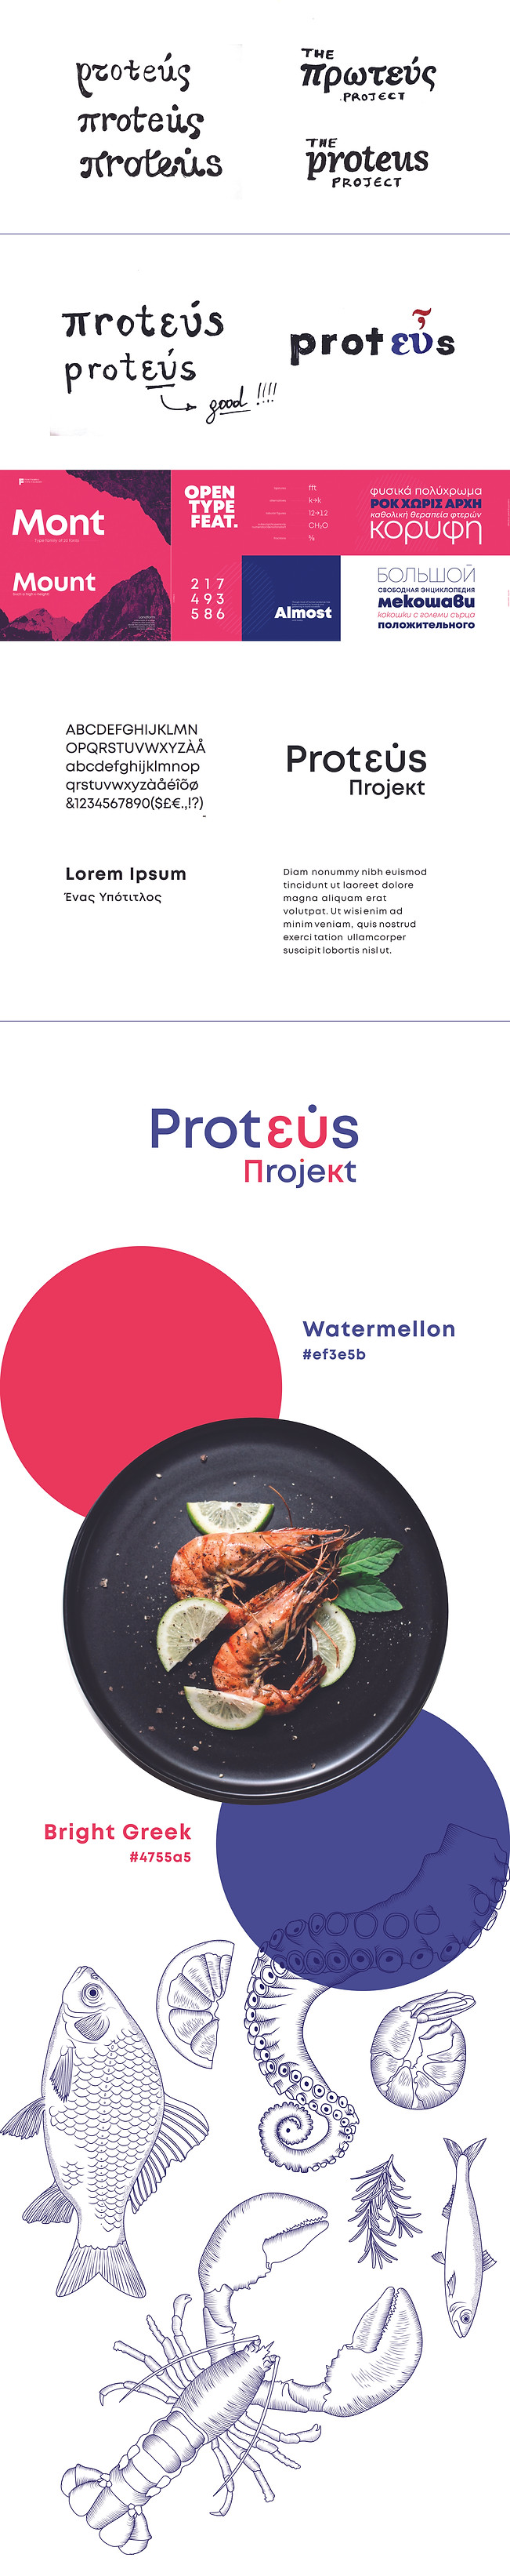 proteus-logo-design-process.jpg